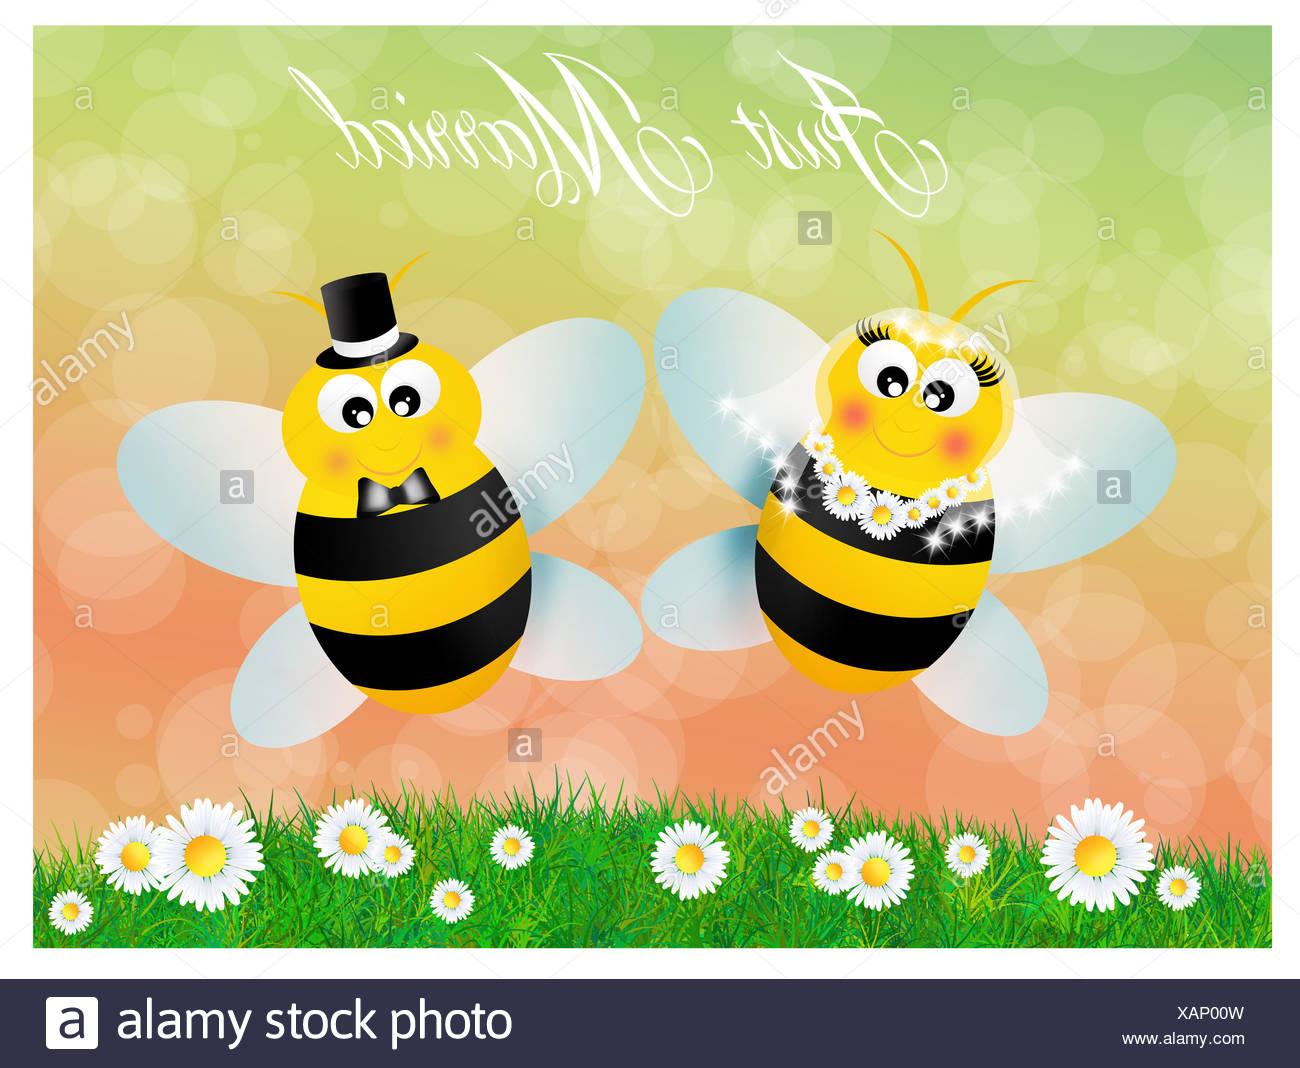 Wedding bees Stock Photo - Alamy